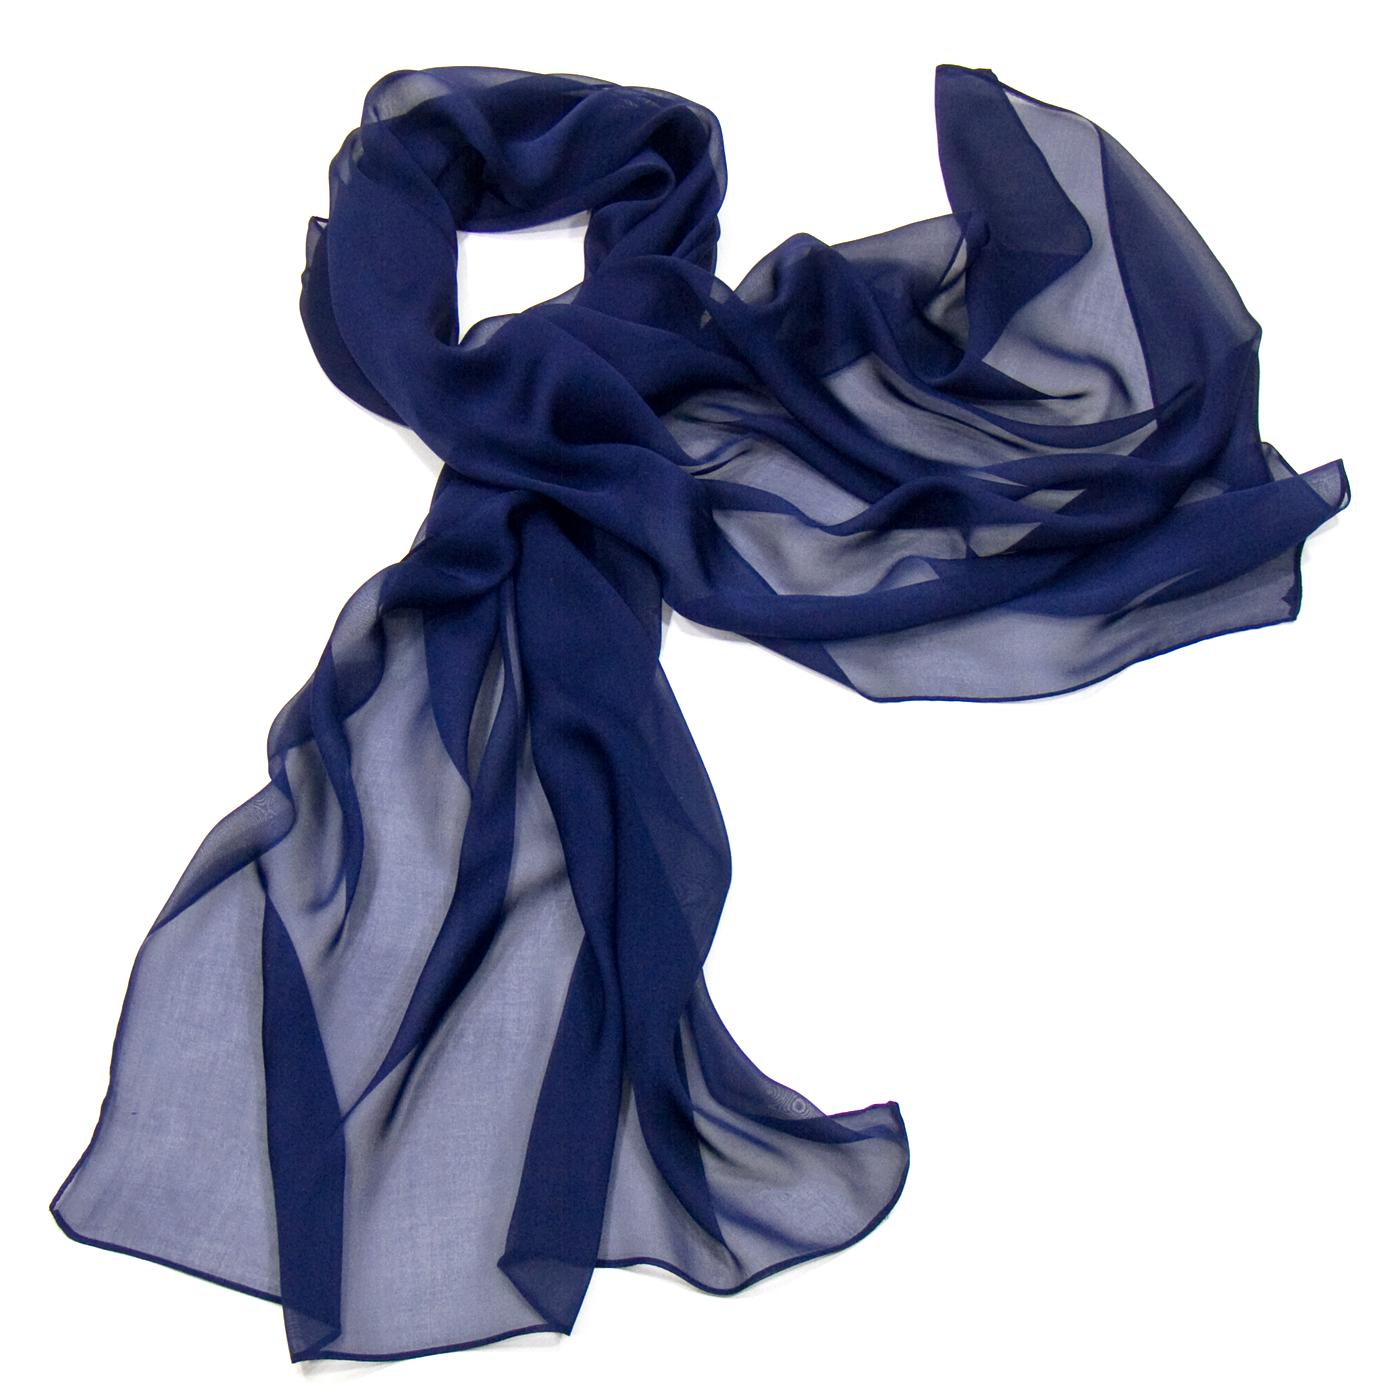 89c2c02ccc0a Etole Bleu